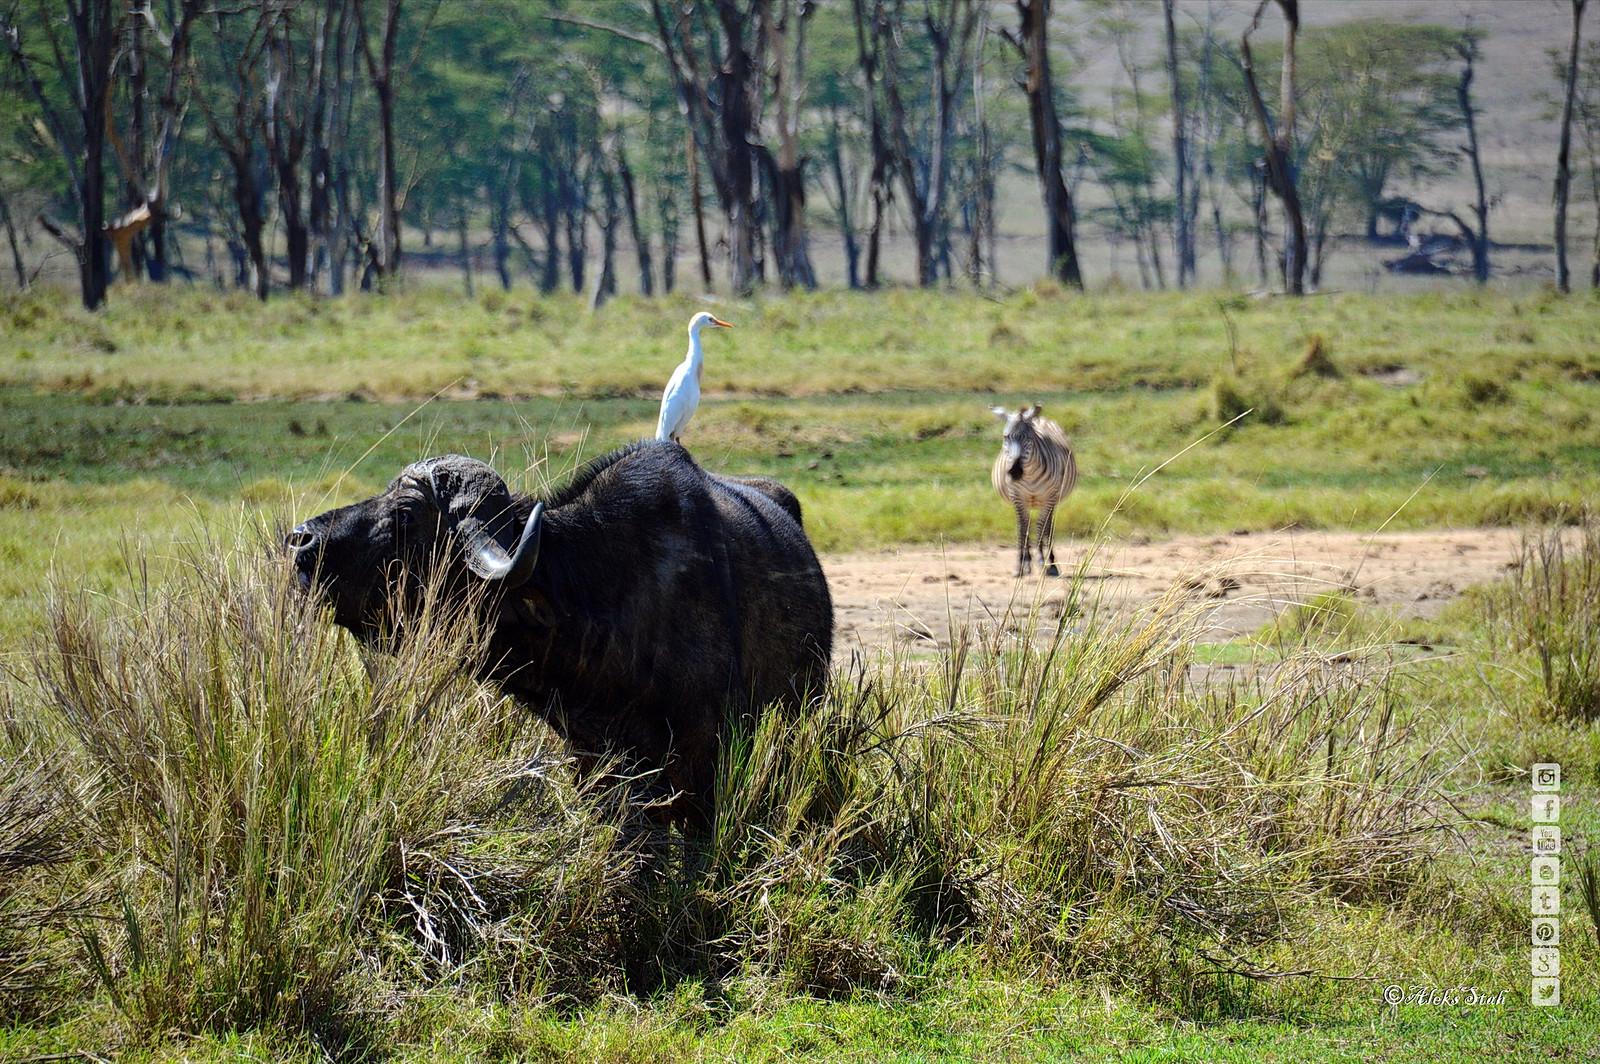 Heron and buffalo. Цапля и буйвол